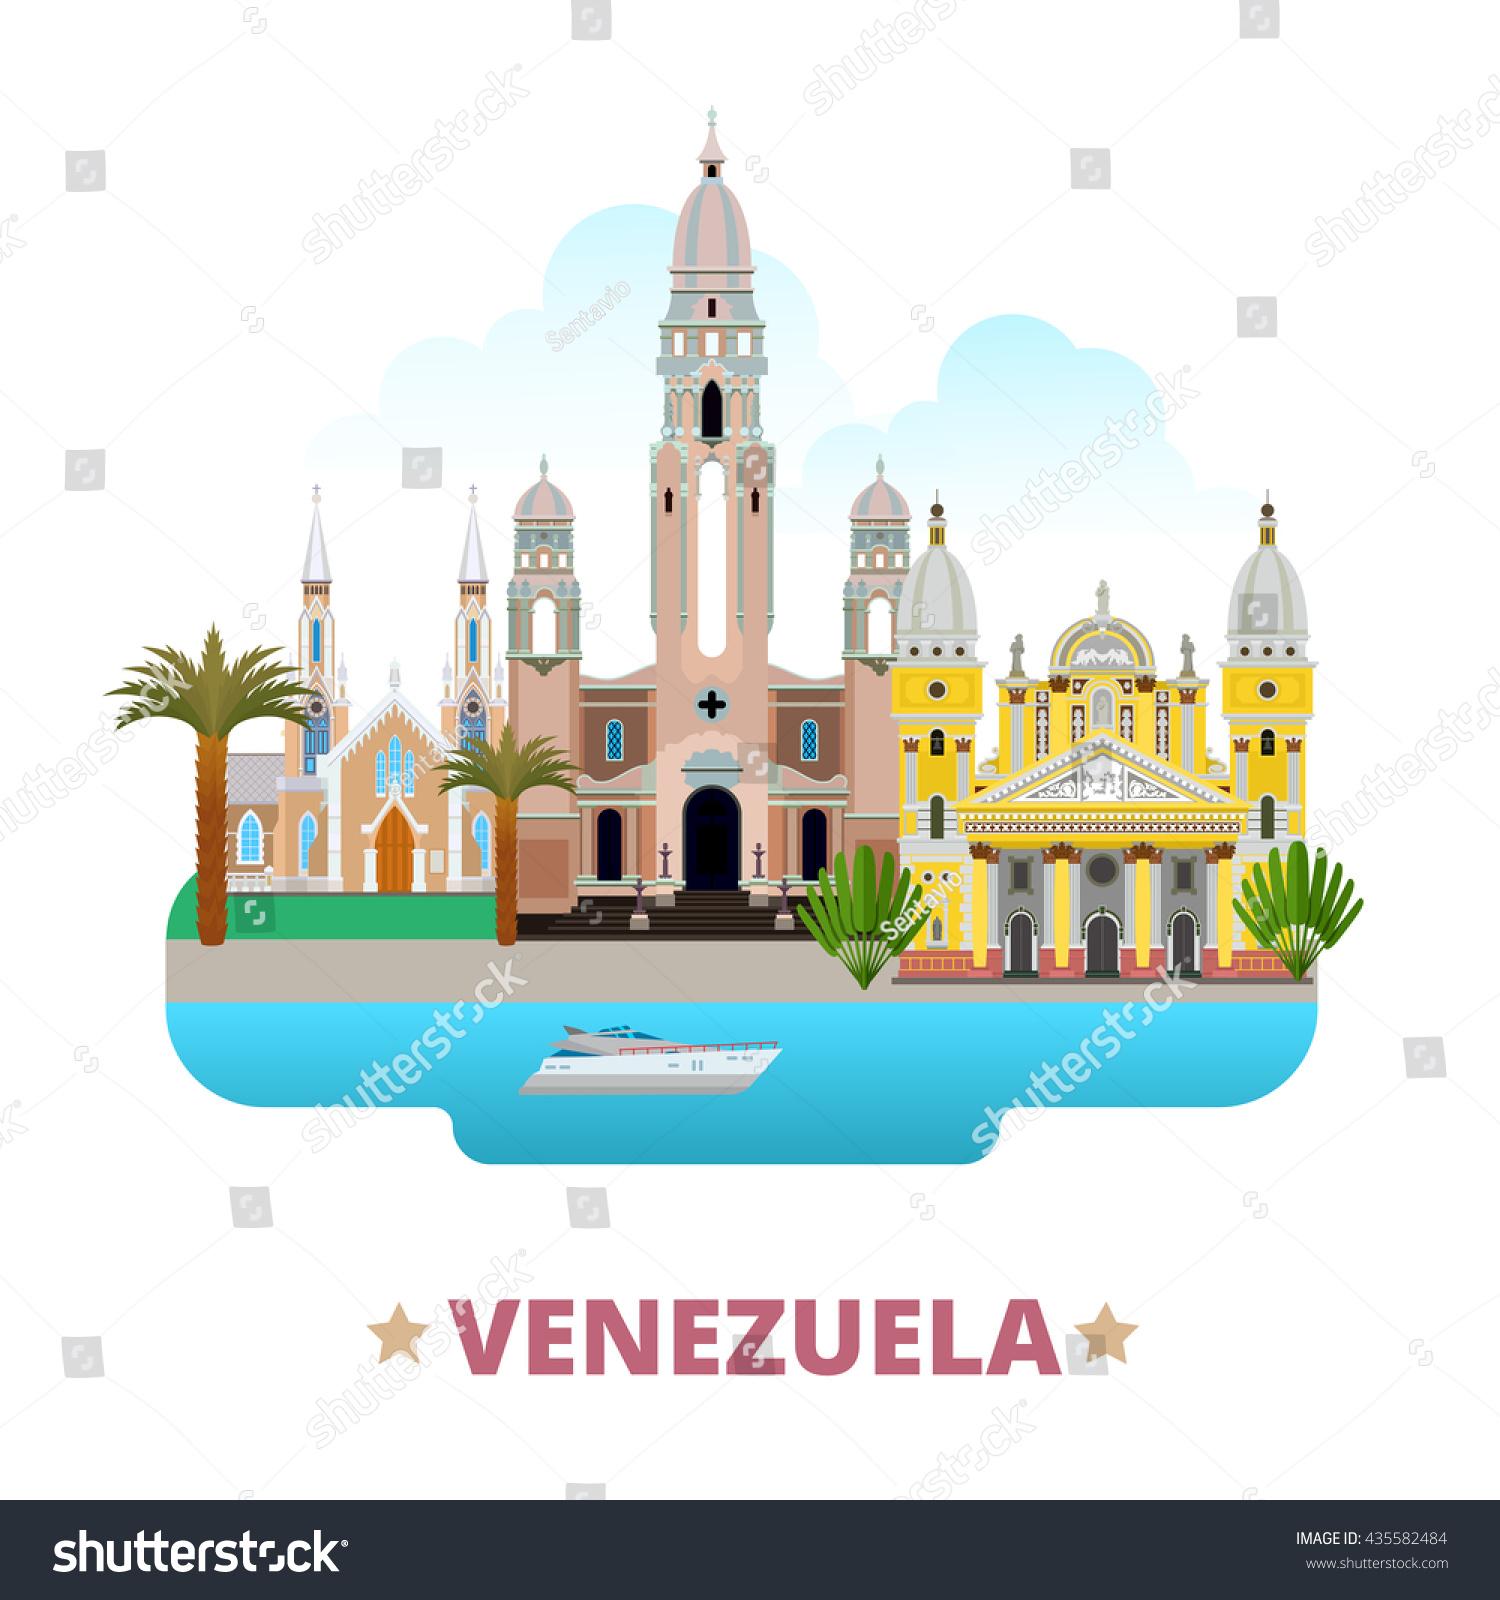 Venezuela country flat cartoon style historic stock vector venezuela country flat cartoon style historic sight web site vector illustration world travel south america pronofoot35fo Gallery